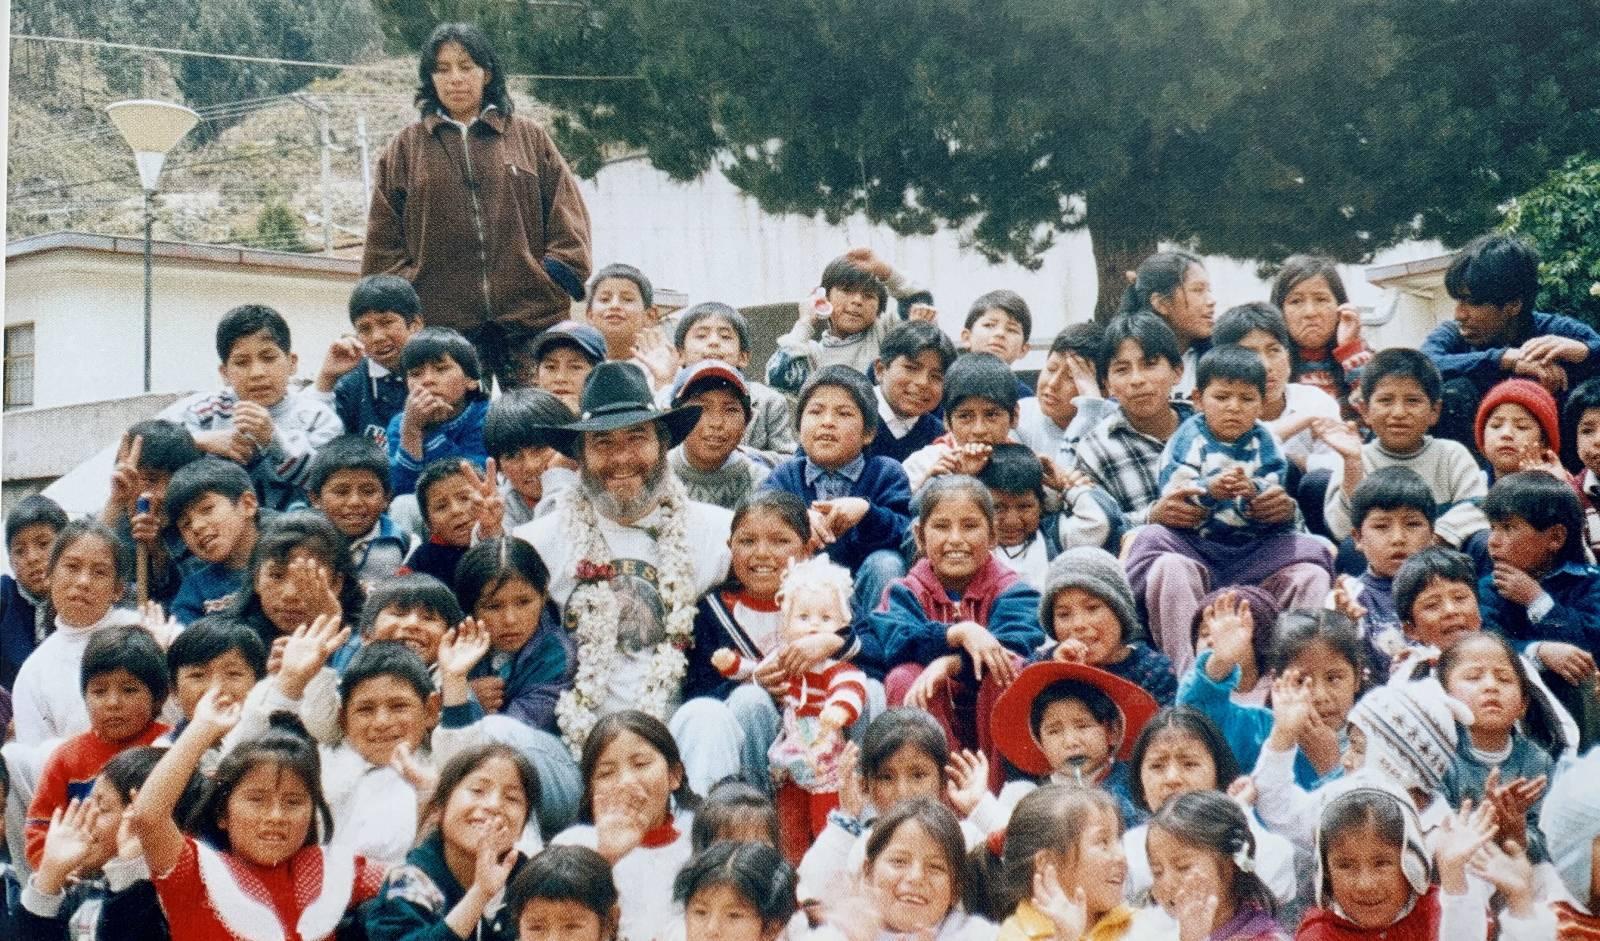 Baste Fanebust med barna i Bolivia